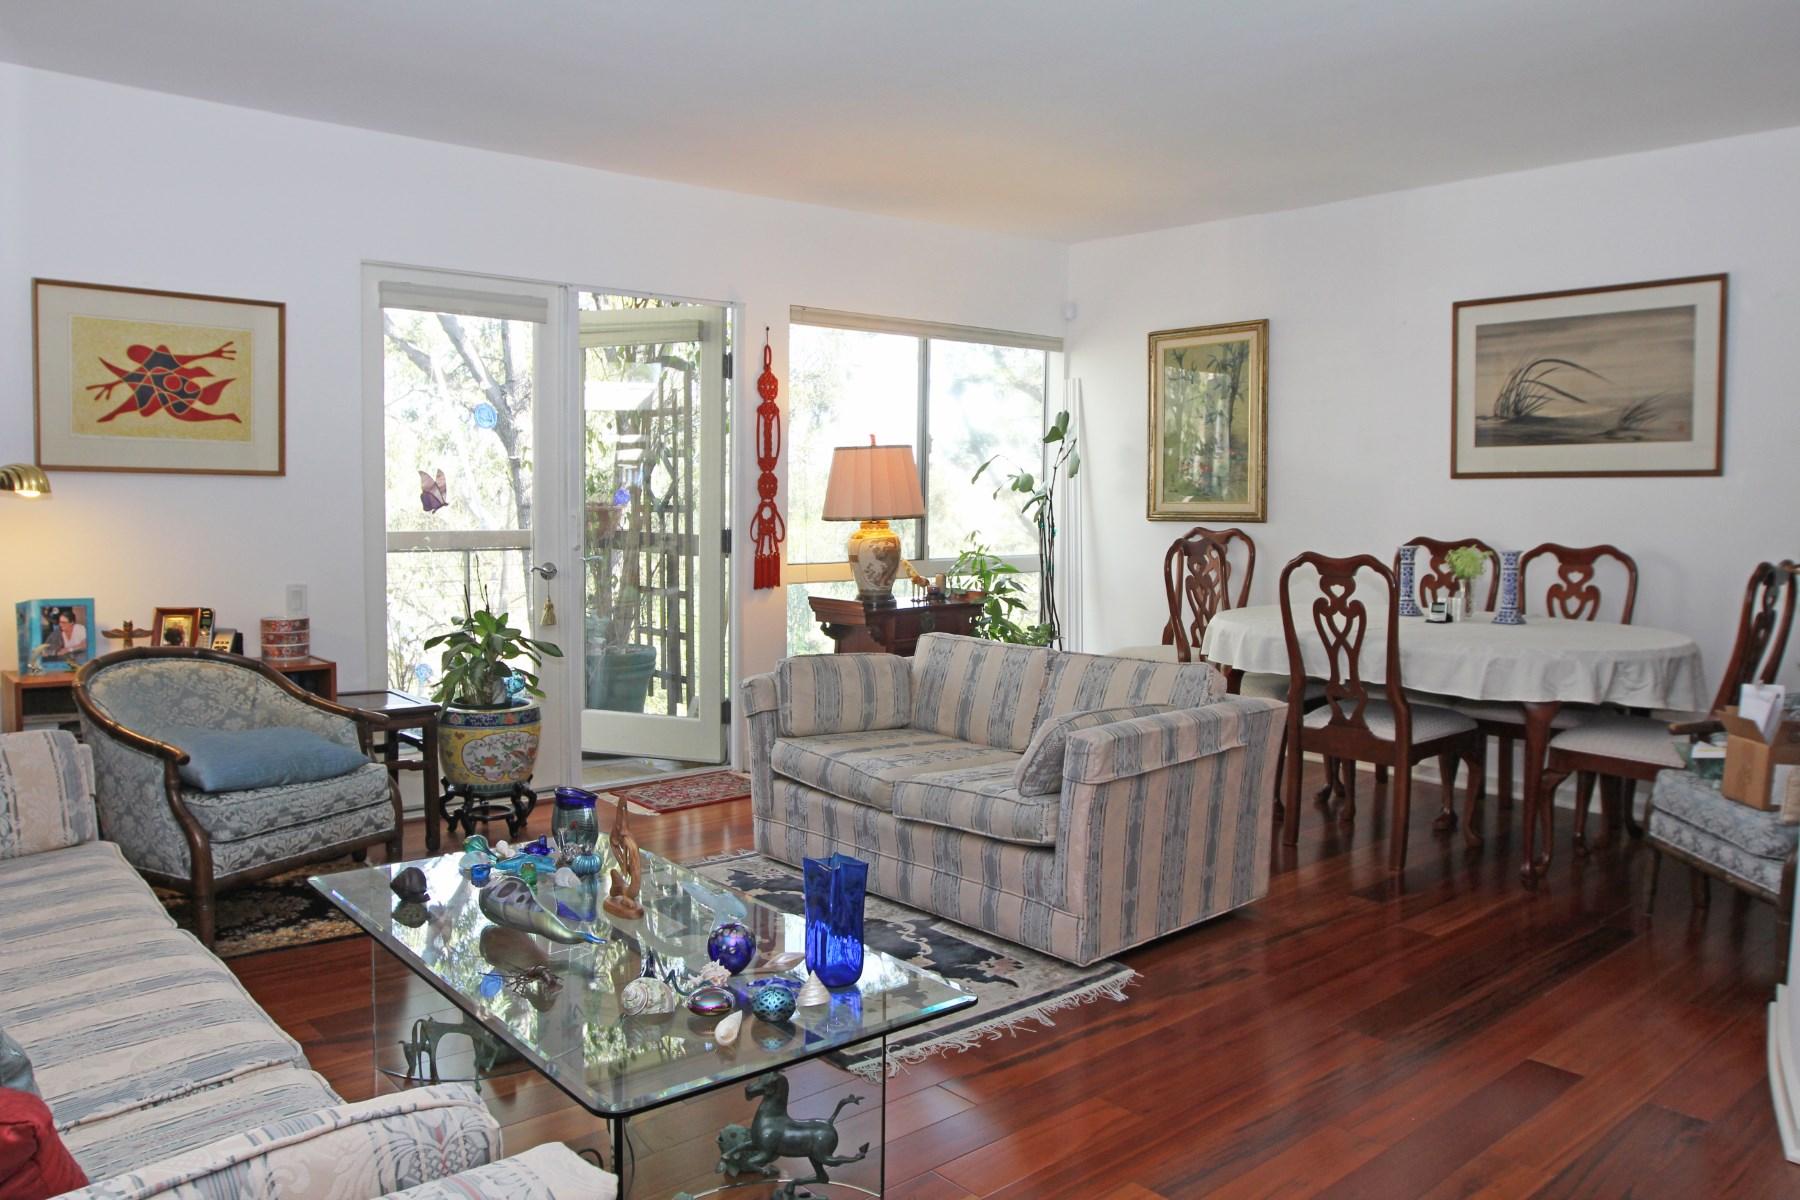 Condominium for Sale at Barrington Fields Condo 330 South Barrington Avenue #305 Brentwood, Los Angeles, California, 90049 United States